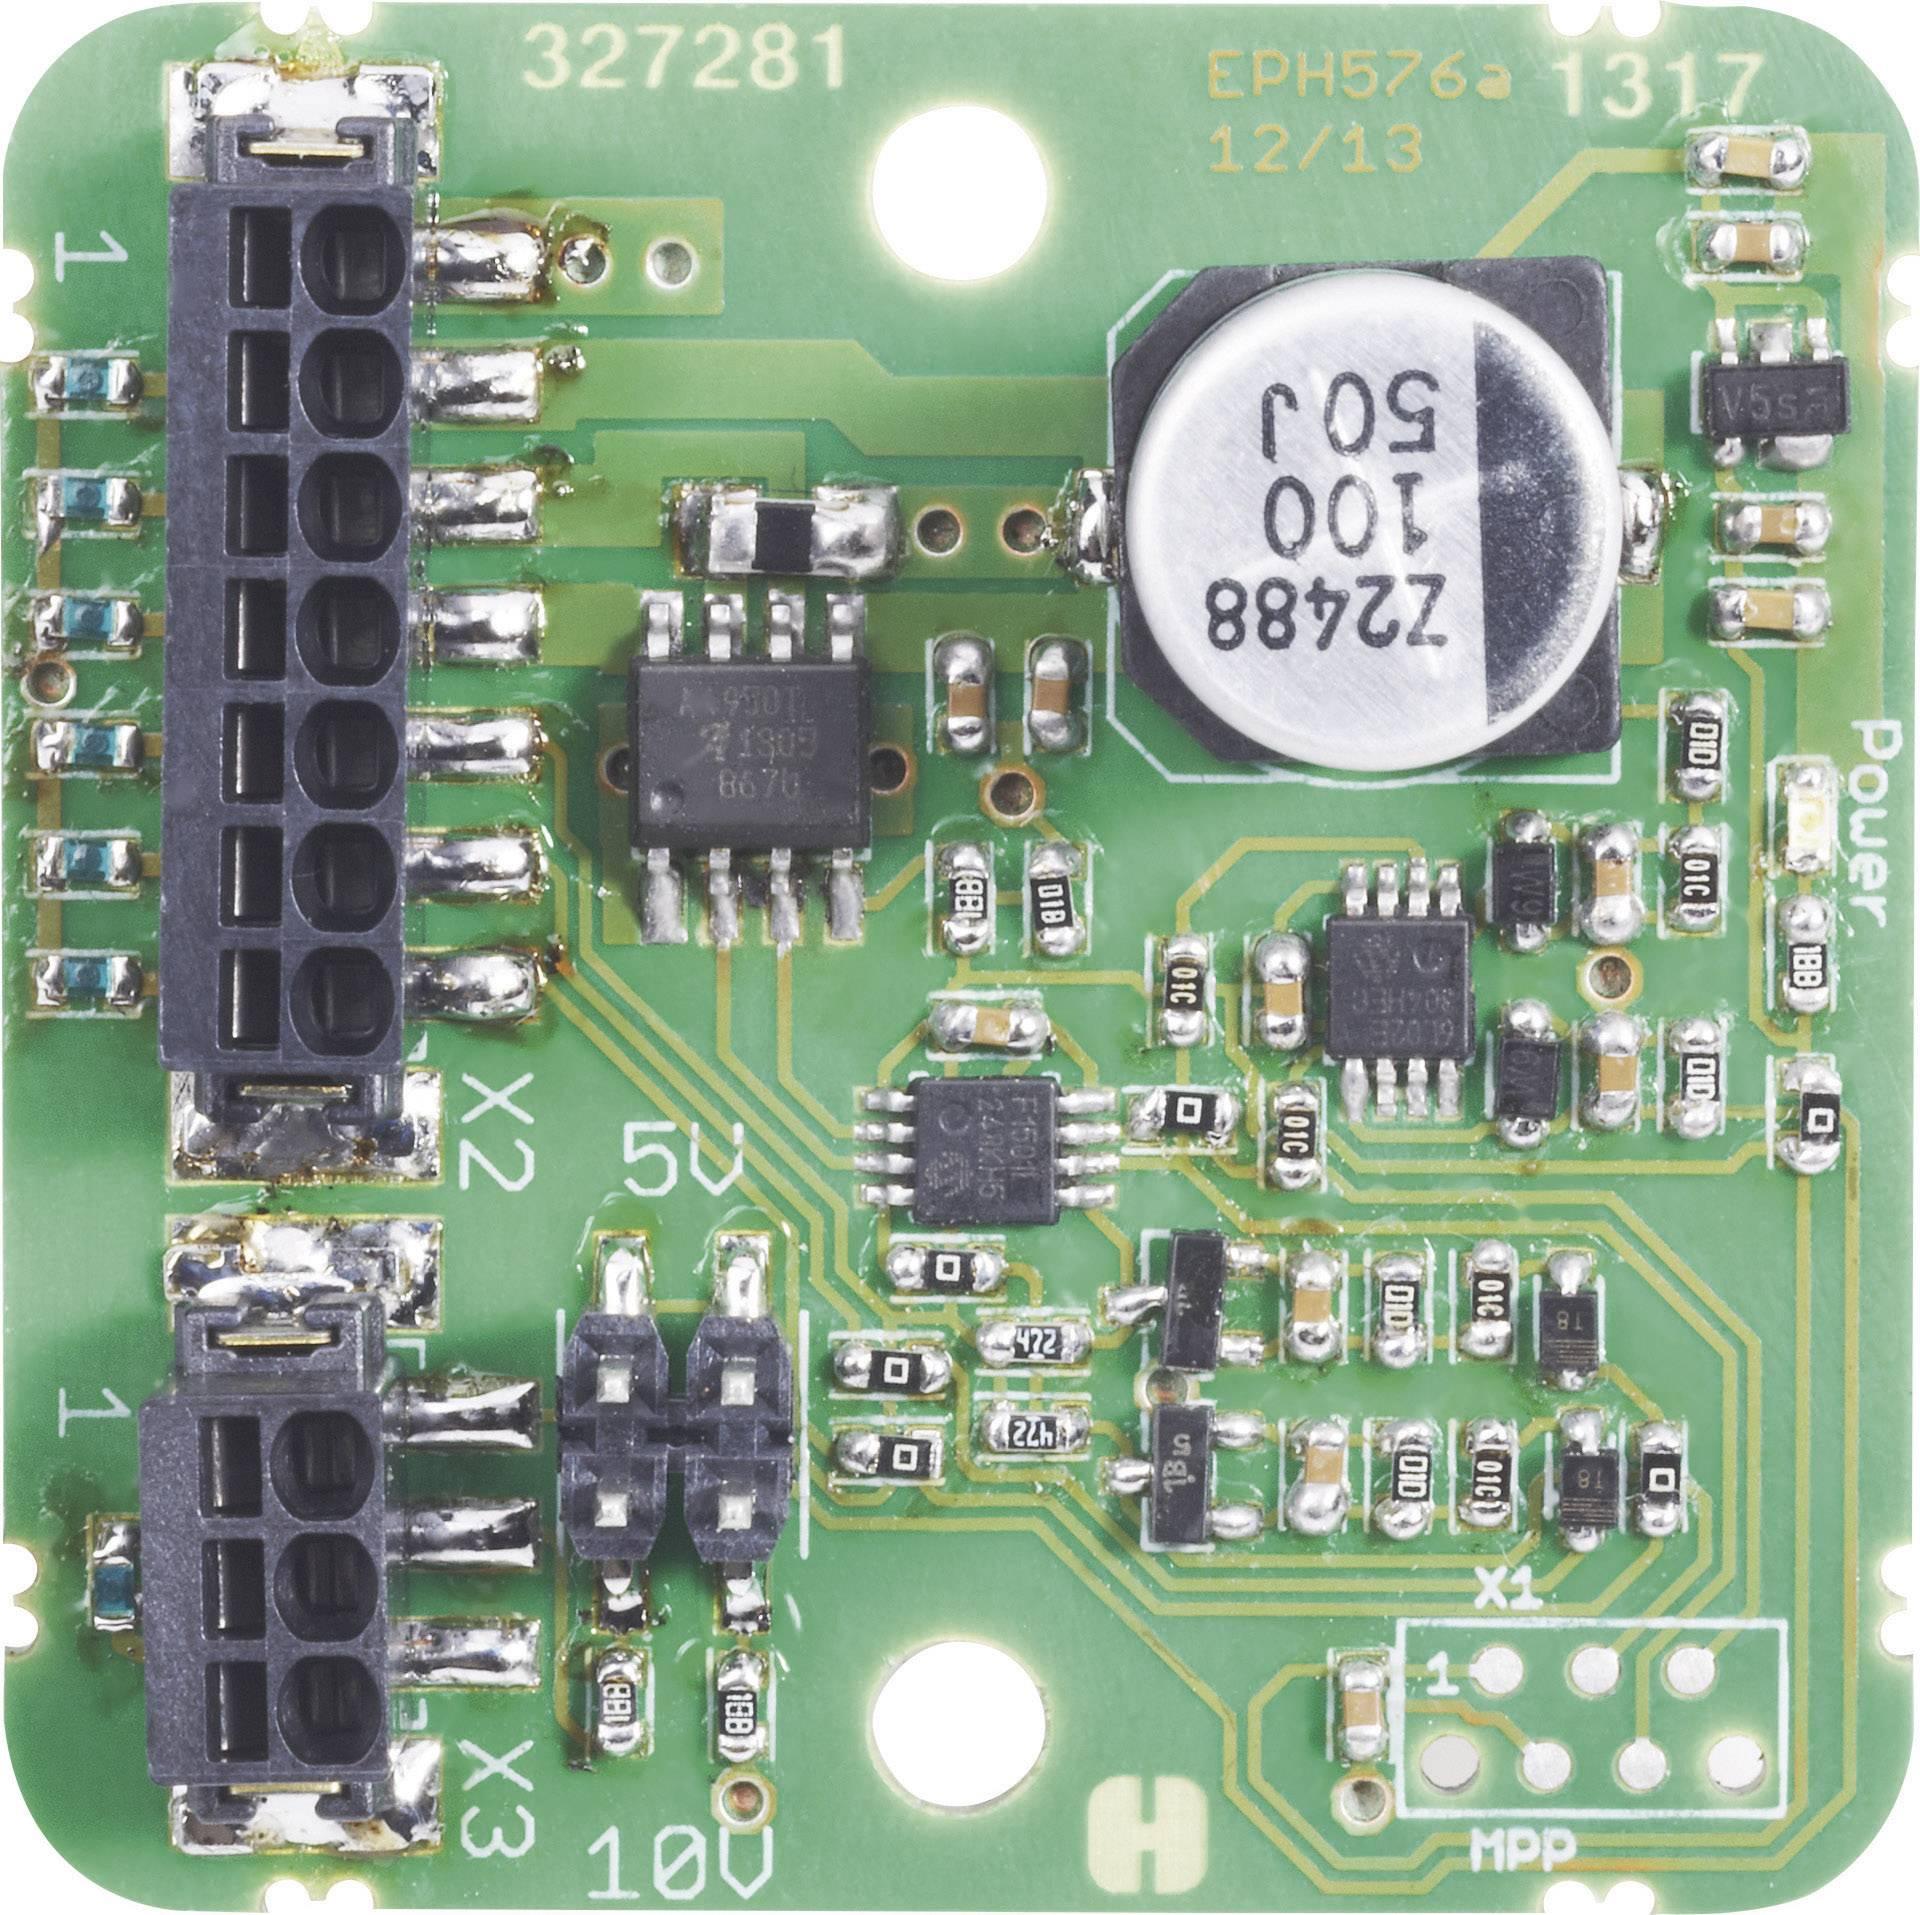 Regulátor otáčok pre DC motory EPH Elektronik DGS 24/03 P 576b.03.0/4145, 3 A, 24 V/DC